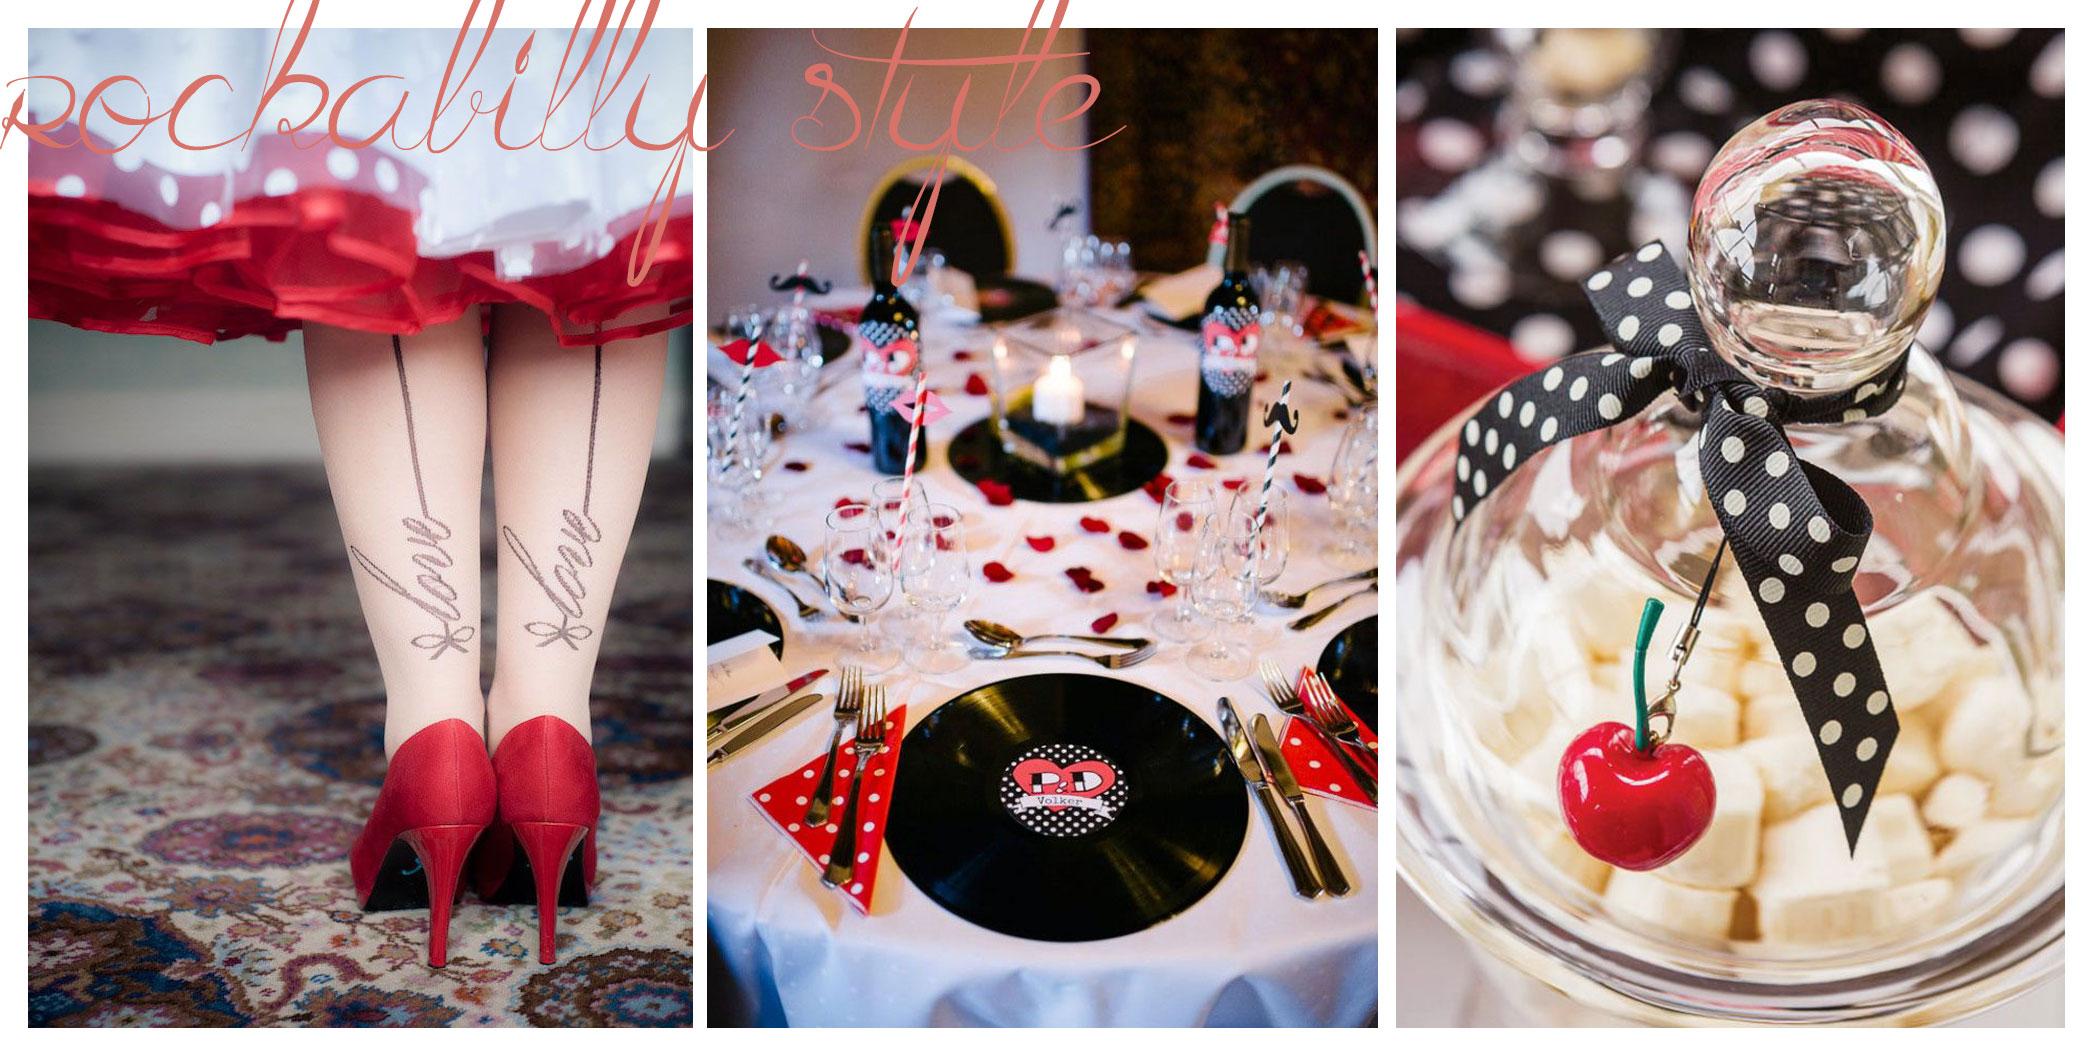 Matrimonio Tema Rock : Nozze ganze tutto per sposarsi in toscana matrimonio